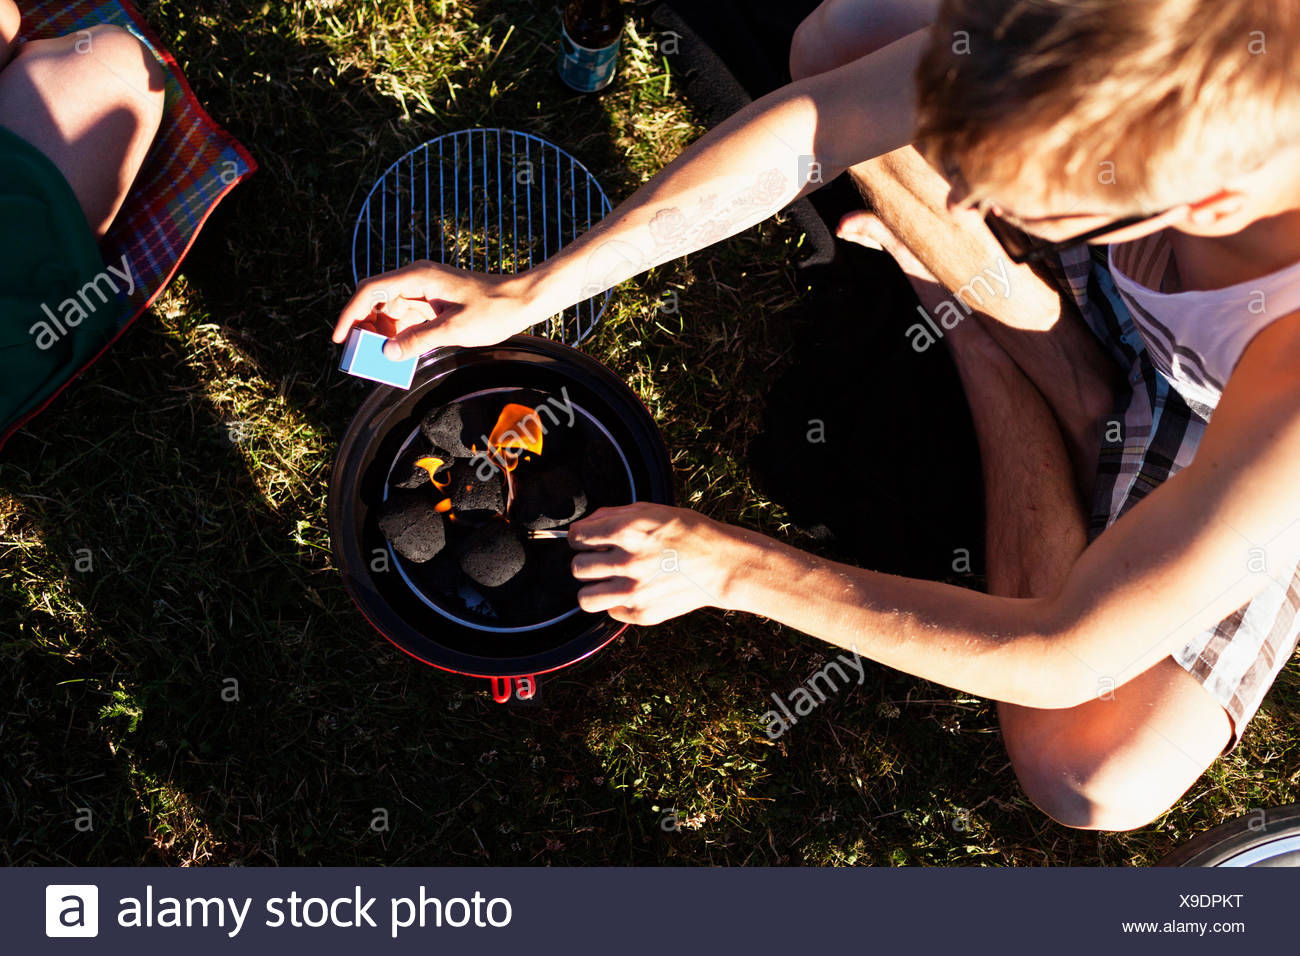 High angle view of man preparing barbeque at picnic - Stock Image